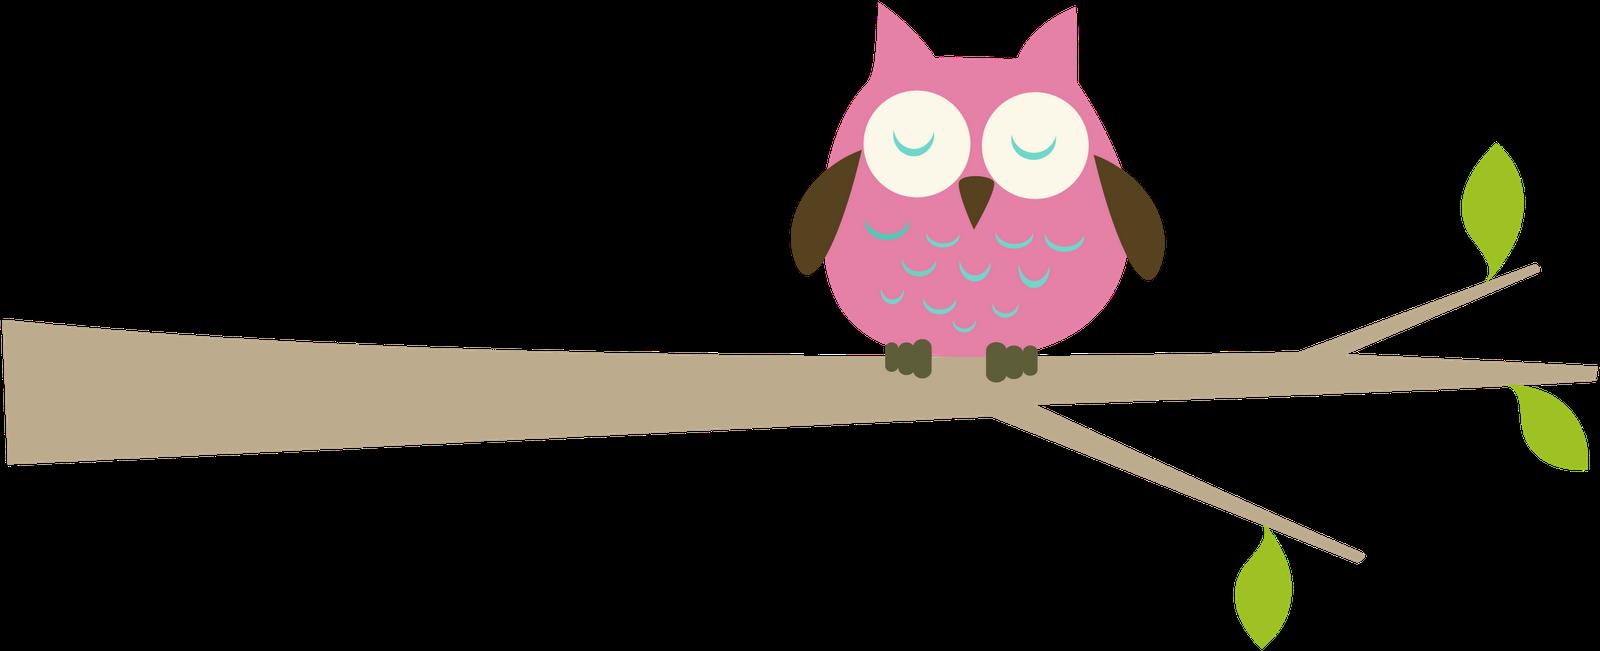 1600x651 Owl Border Clipart